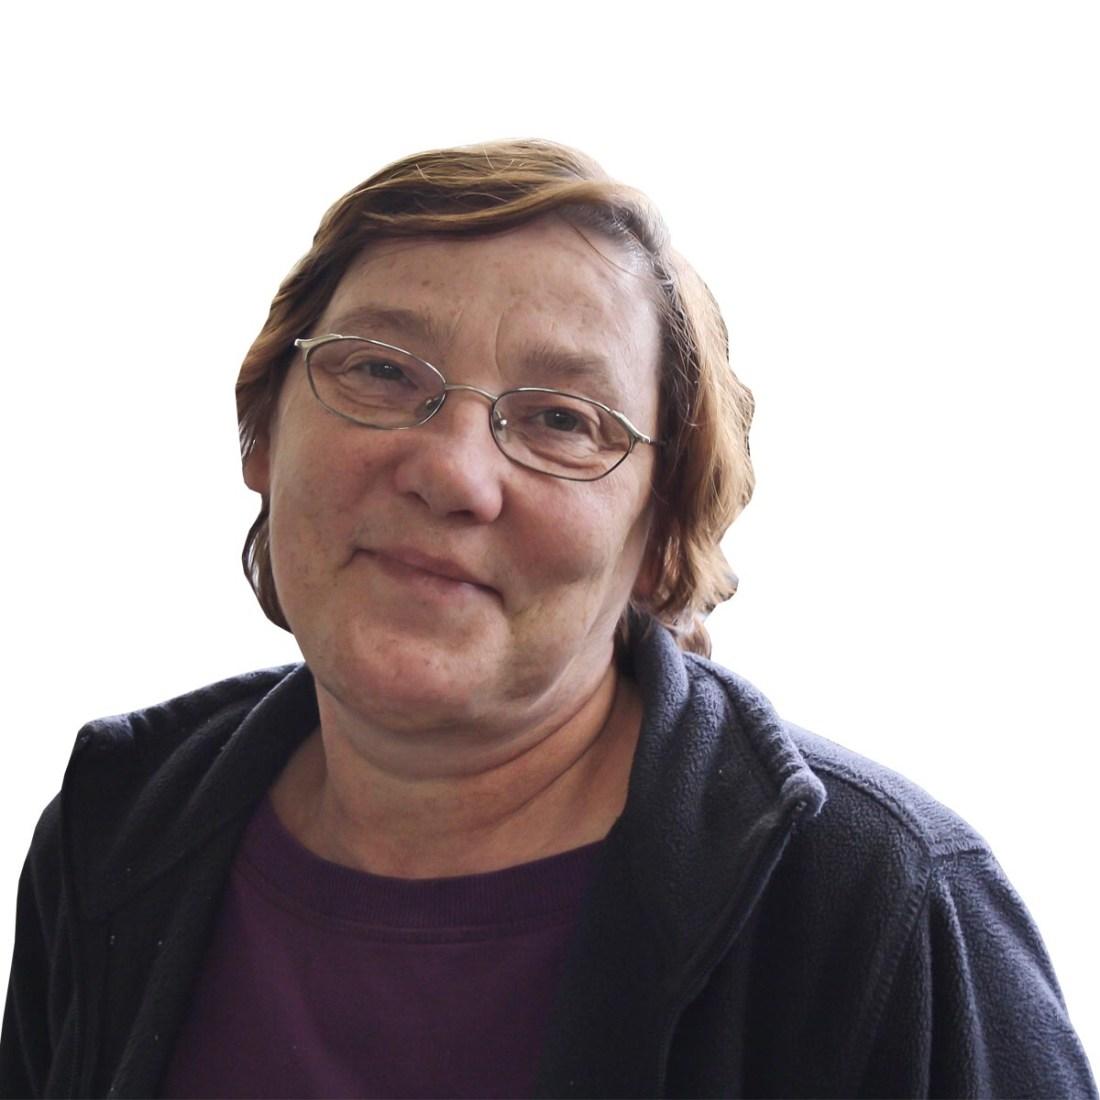 Ilona Brosch